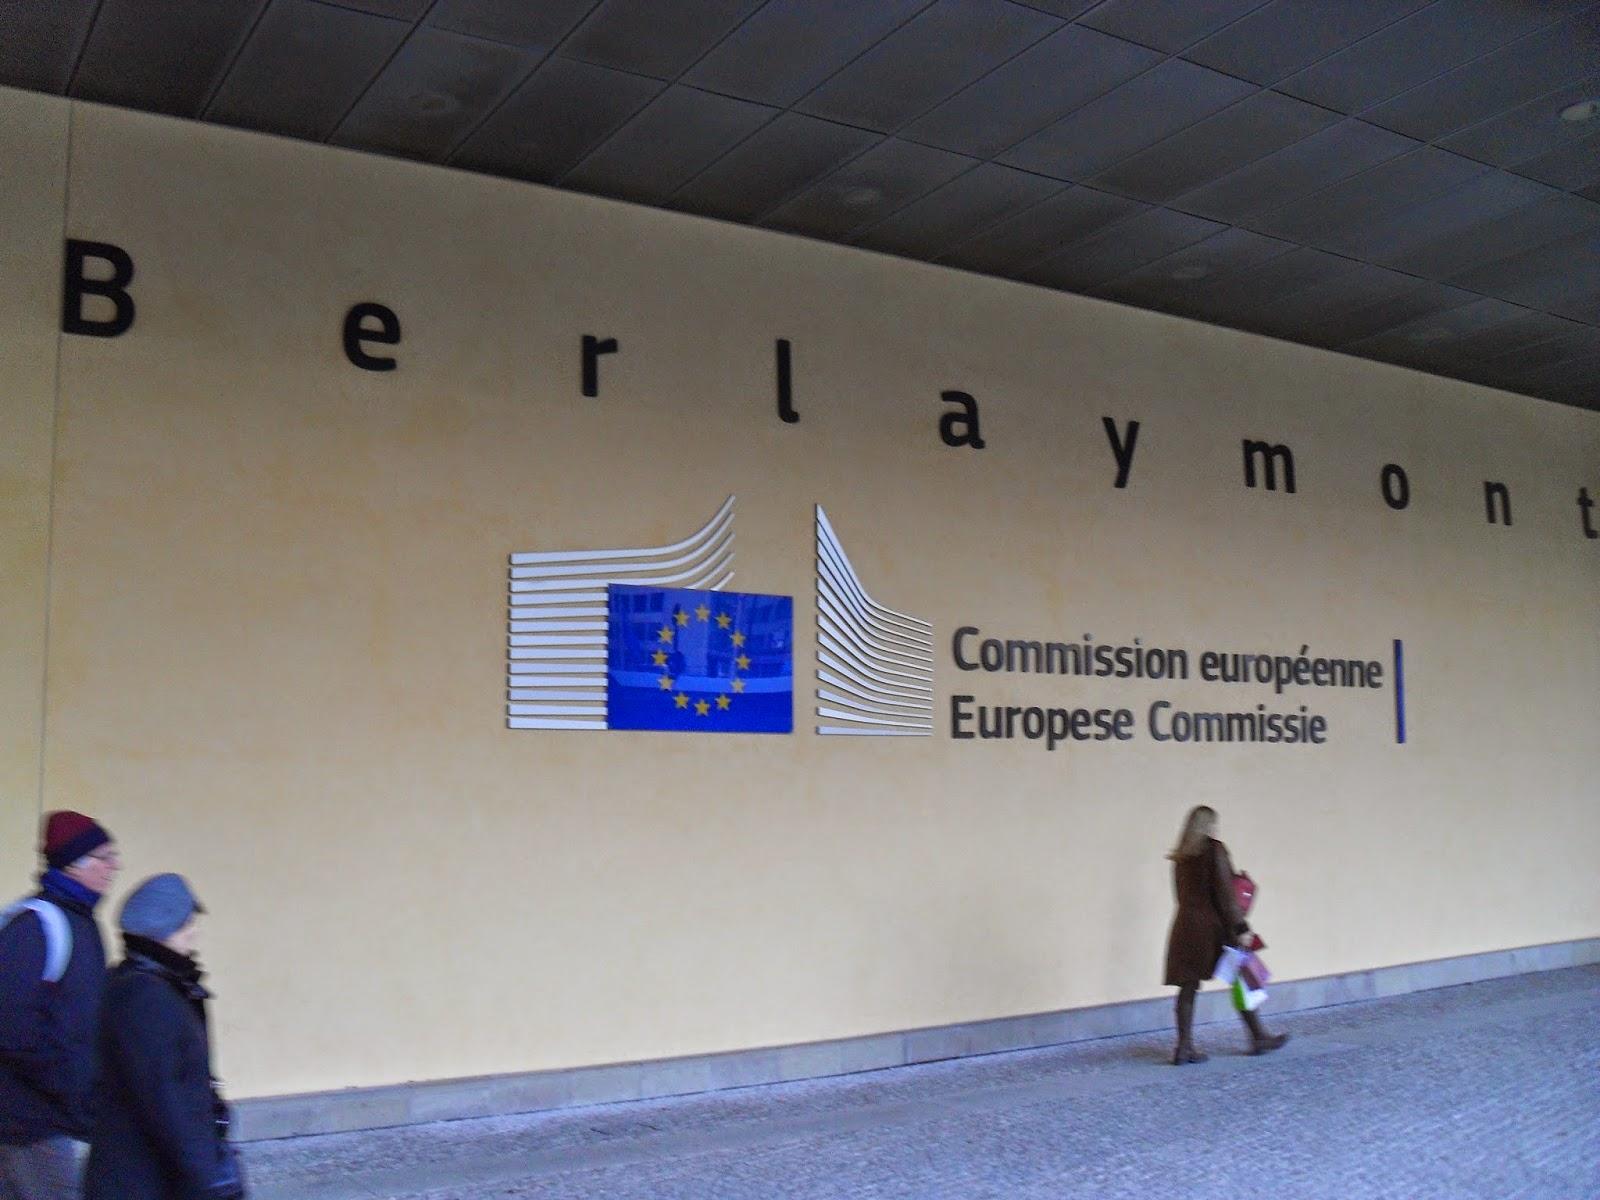 Berlaymont Comisión Europea